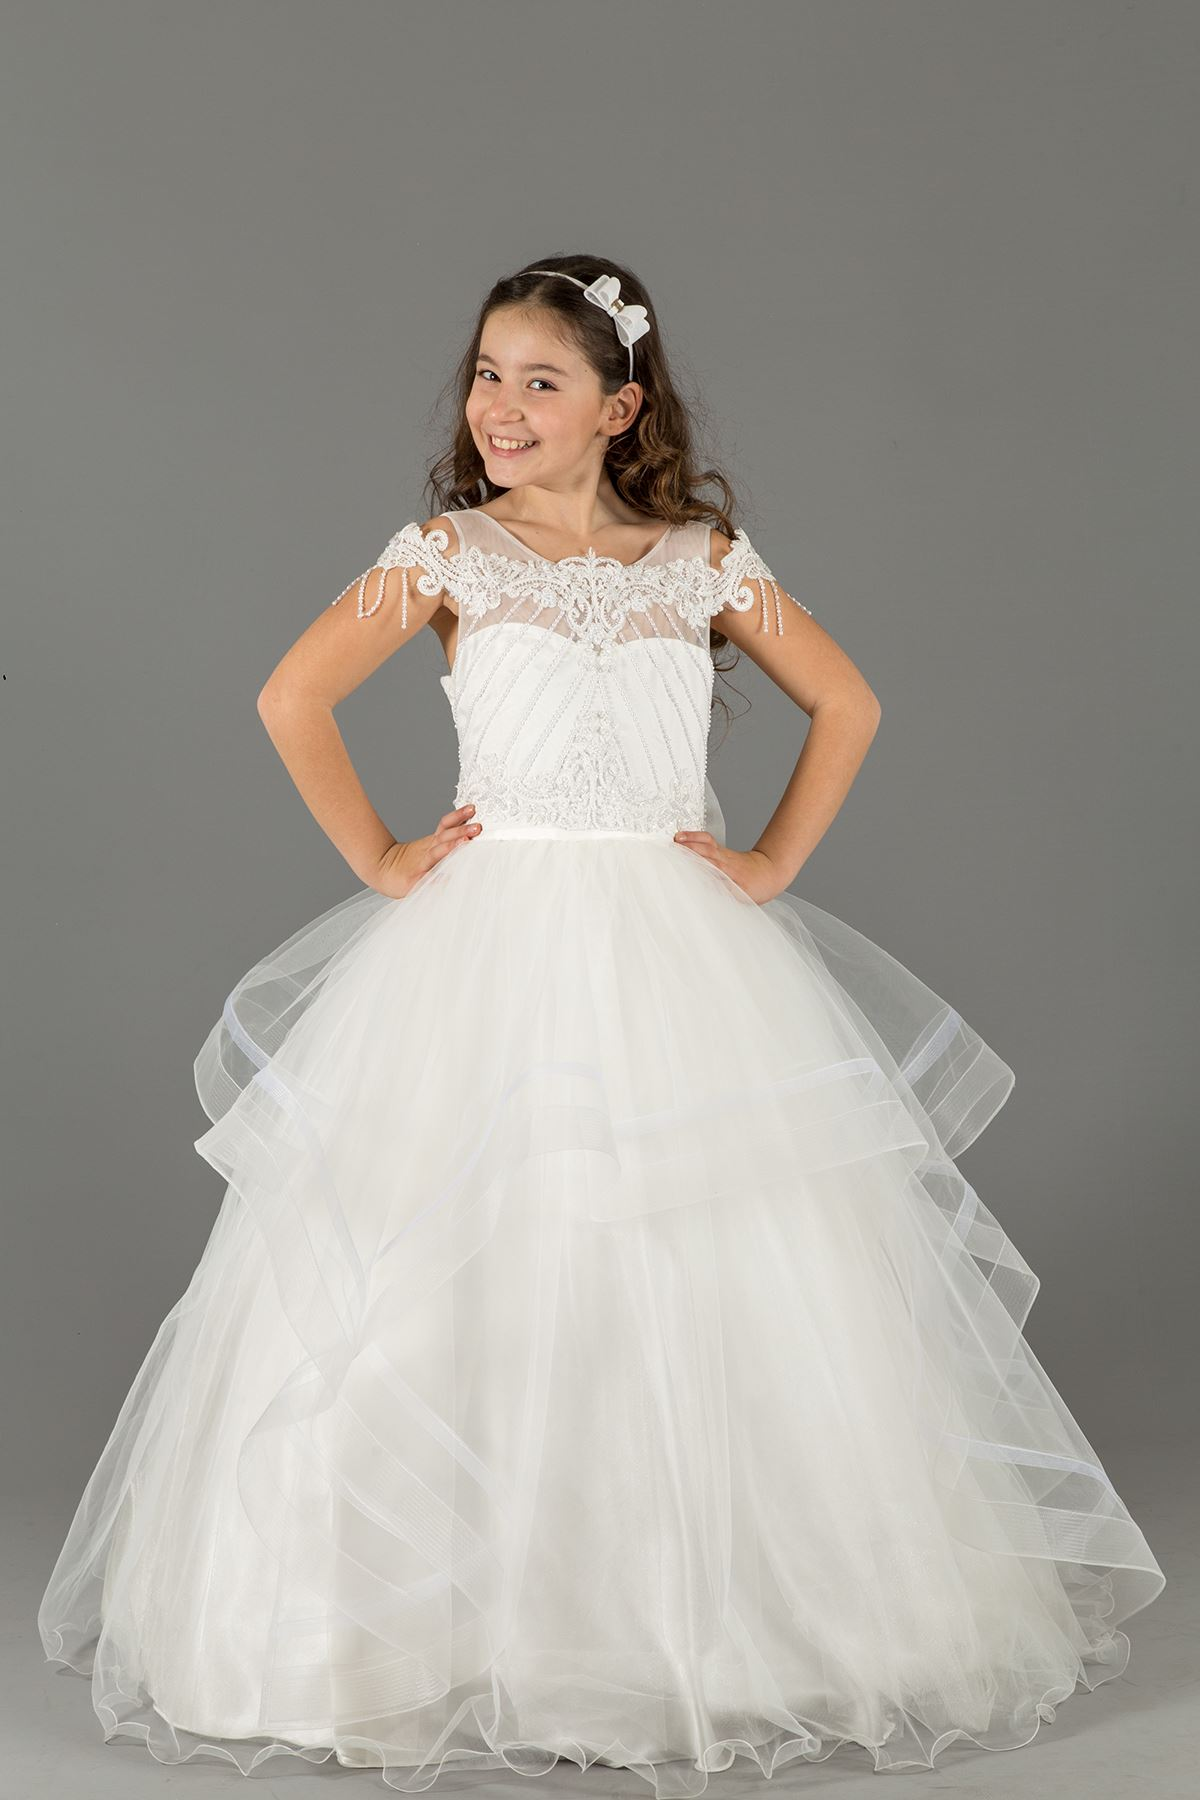 Aplicación bordada, detalle de hombro, falda en capas, vestido de noche de niña esponjosa 591 Crema